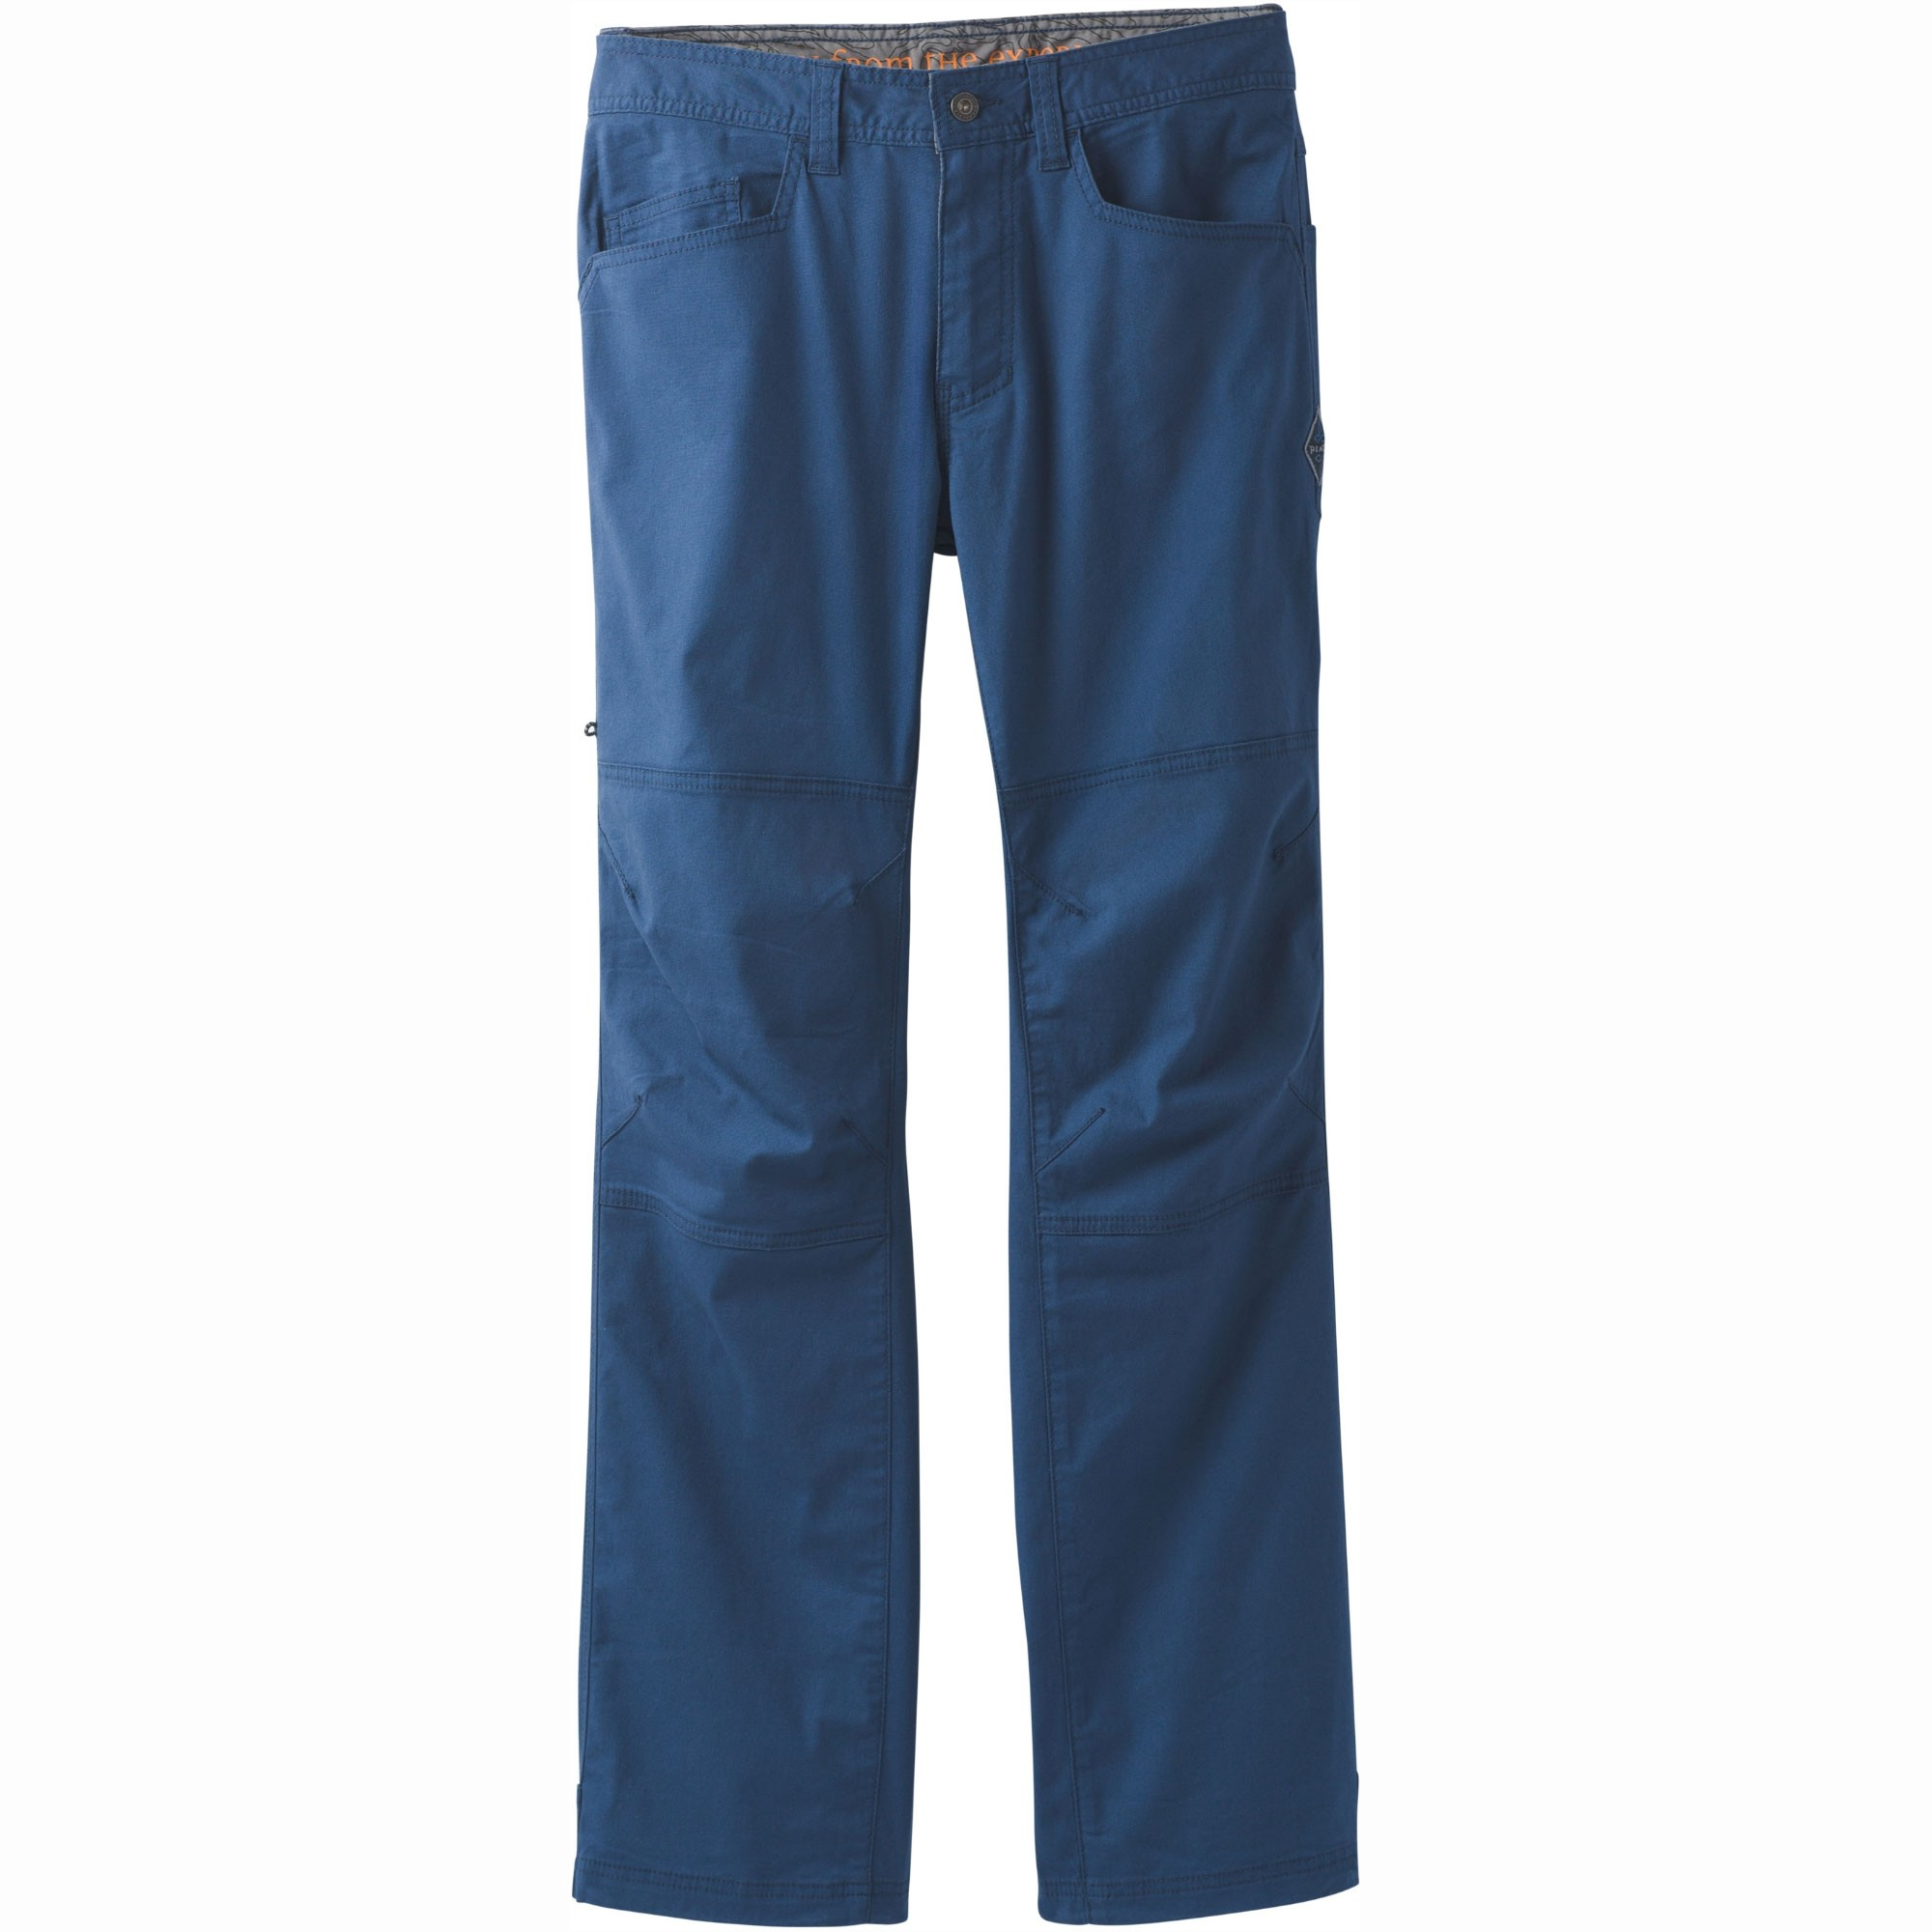 PrAna Goldrush Climbing Pants - Equinox Blue